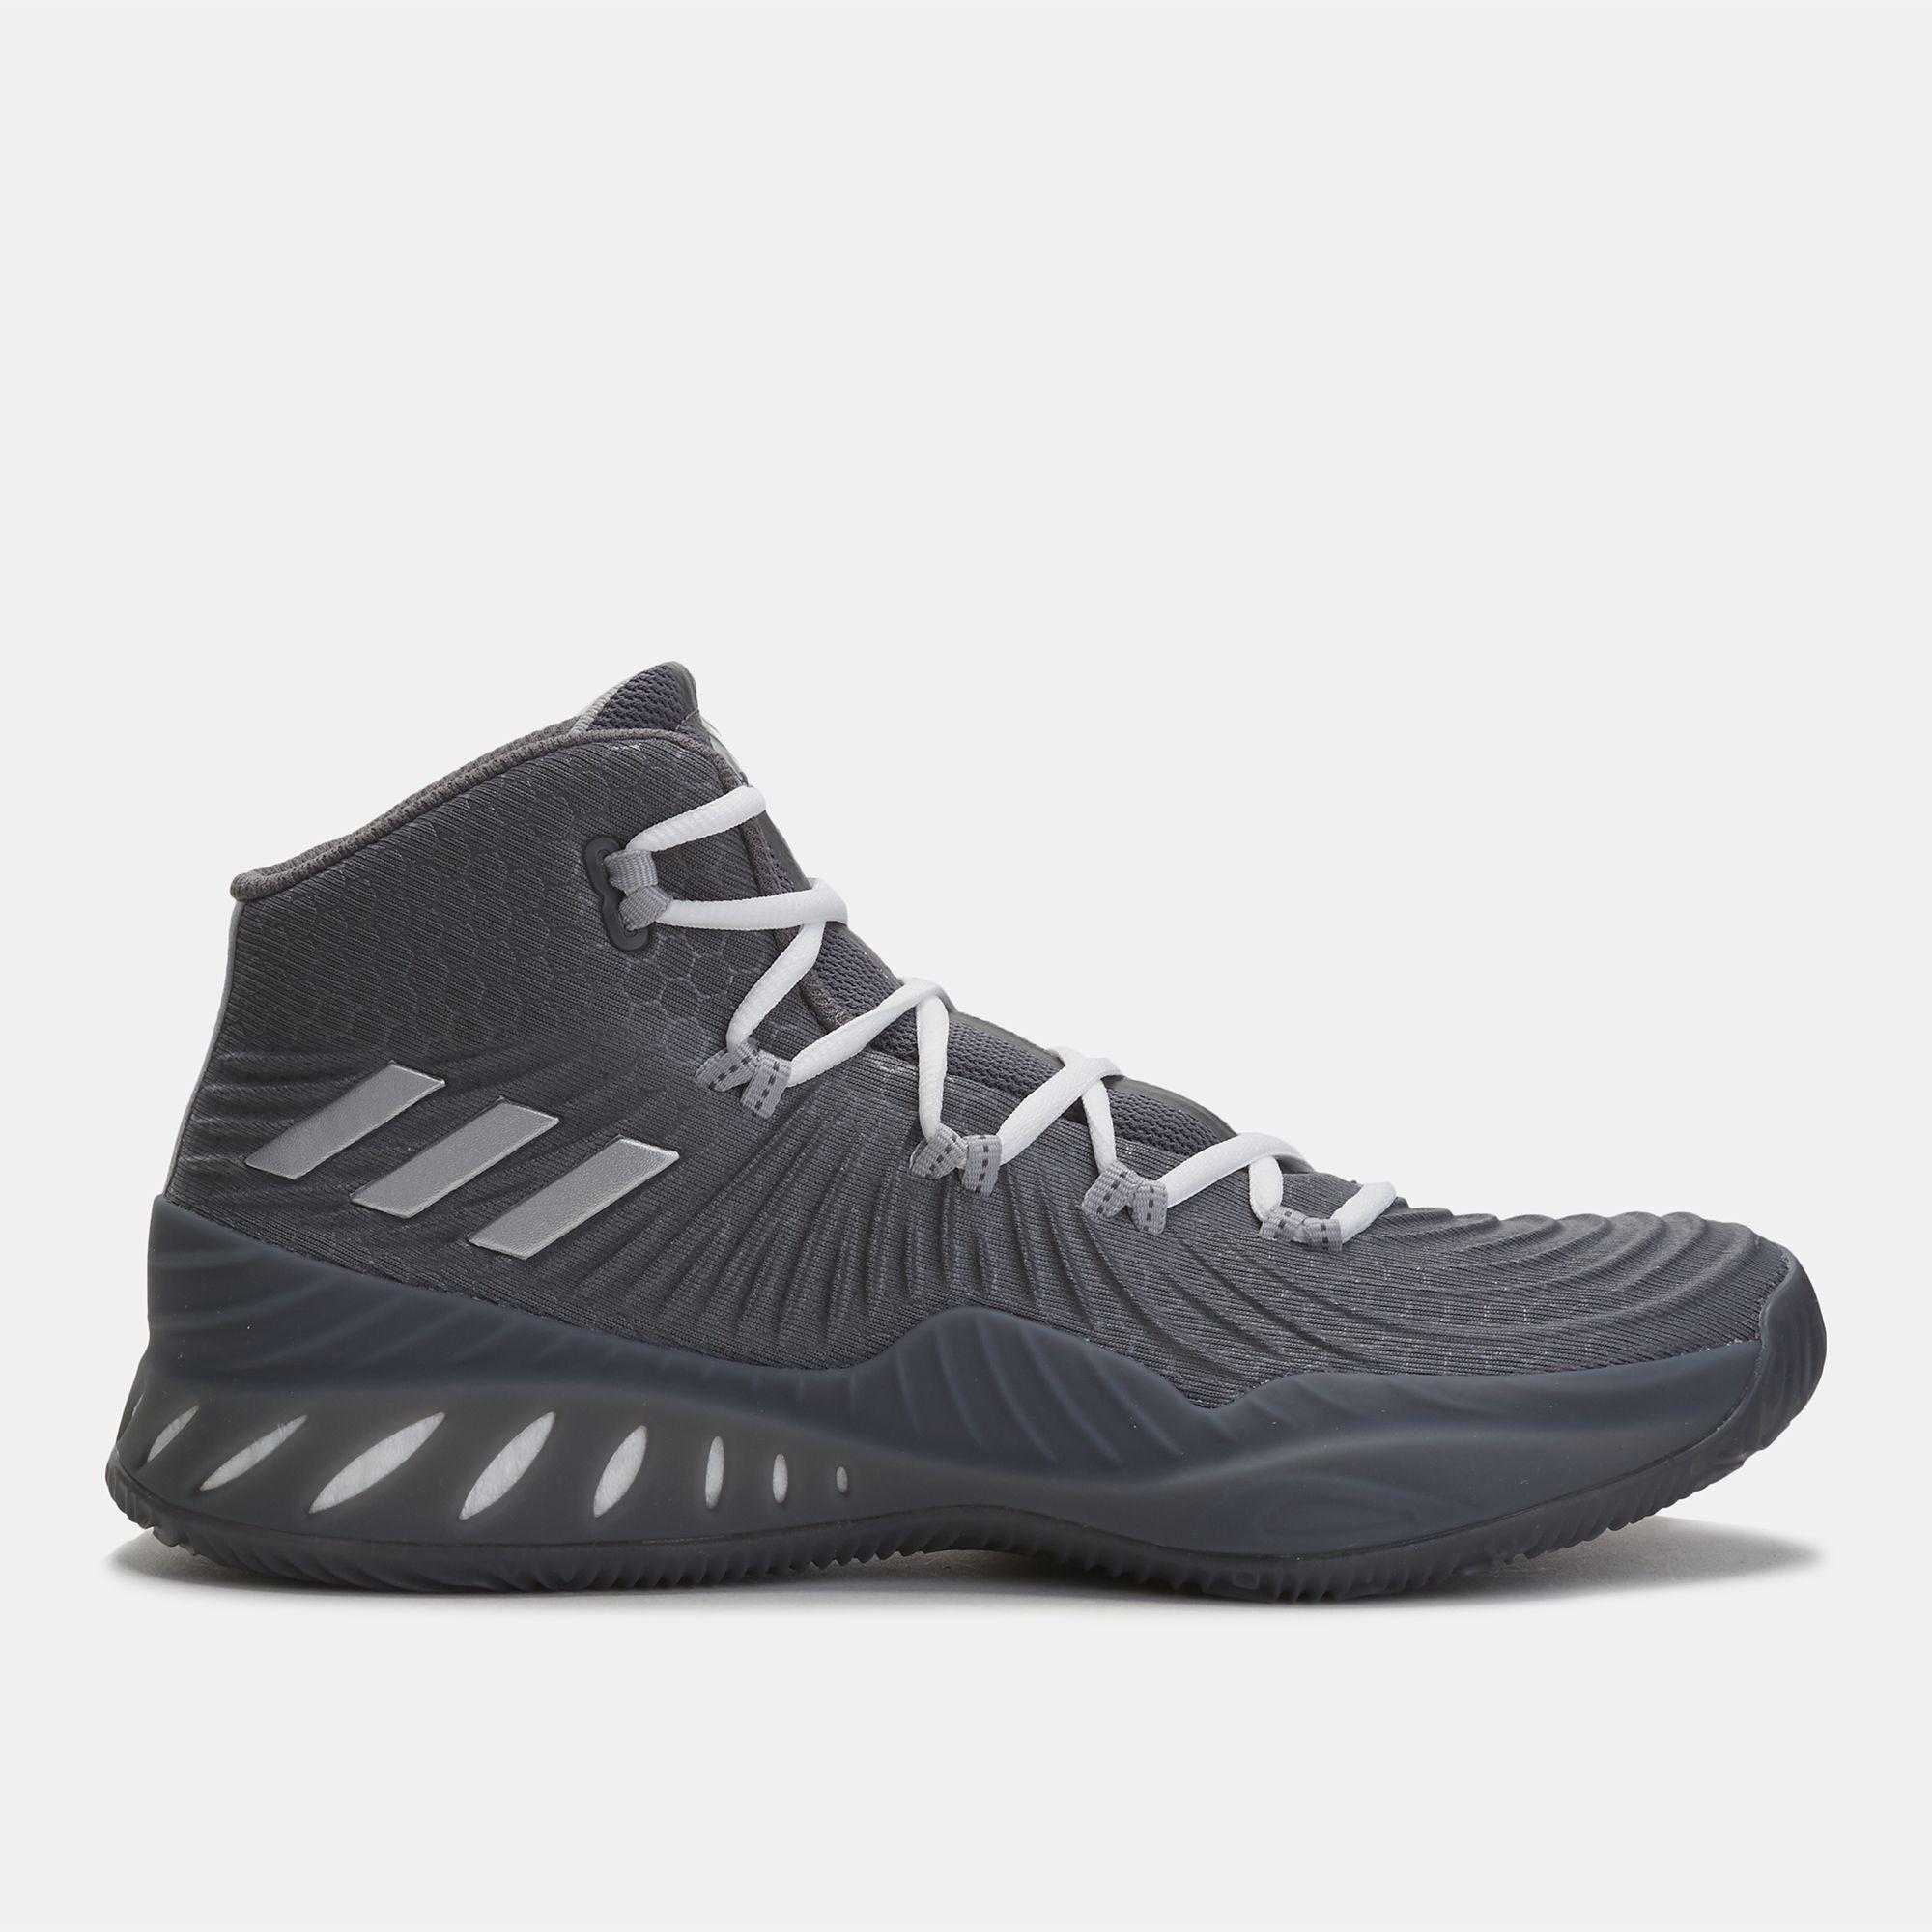 check out bc5d5 56fc8 adidas Crazy Explosive 2017 Shoe